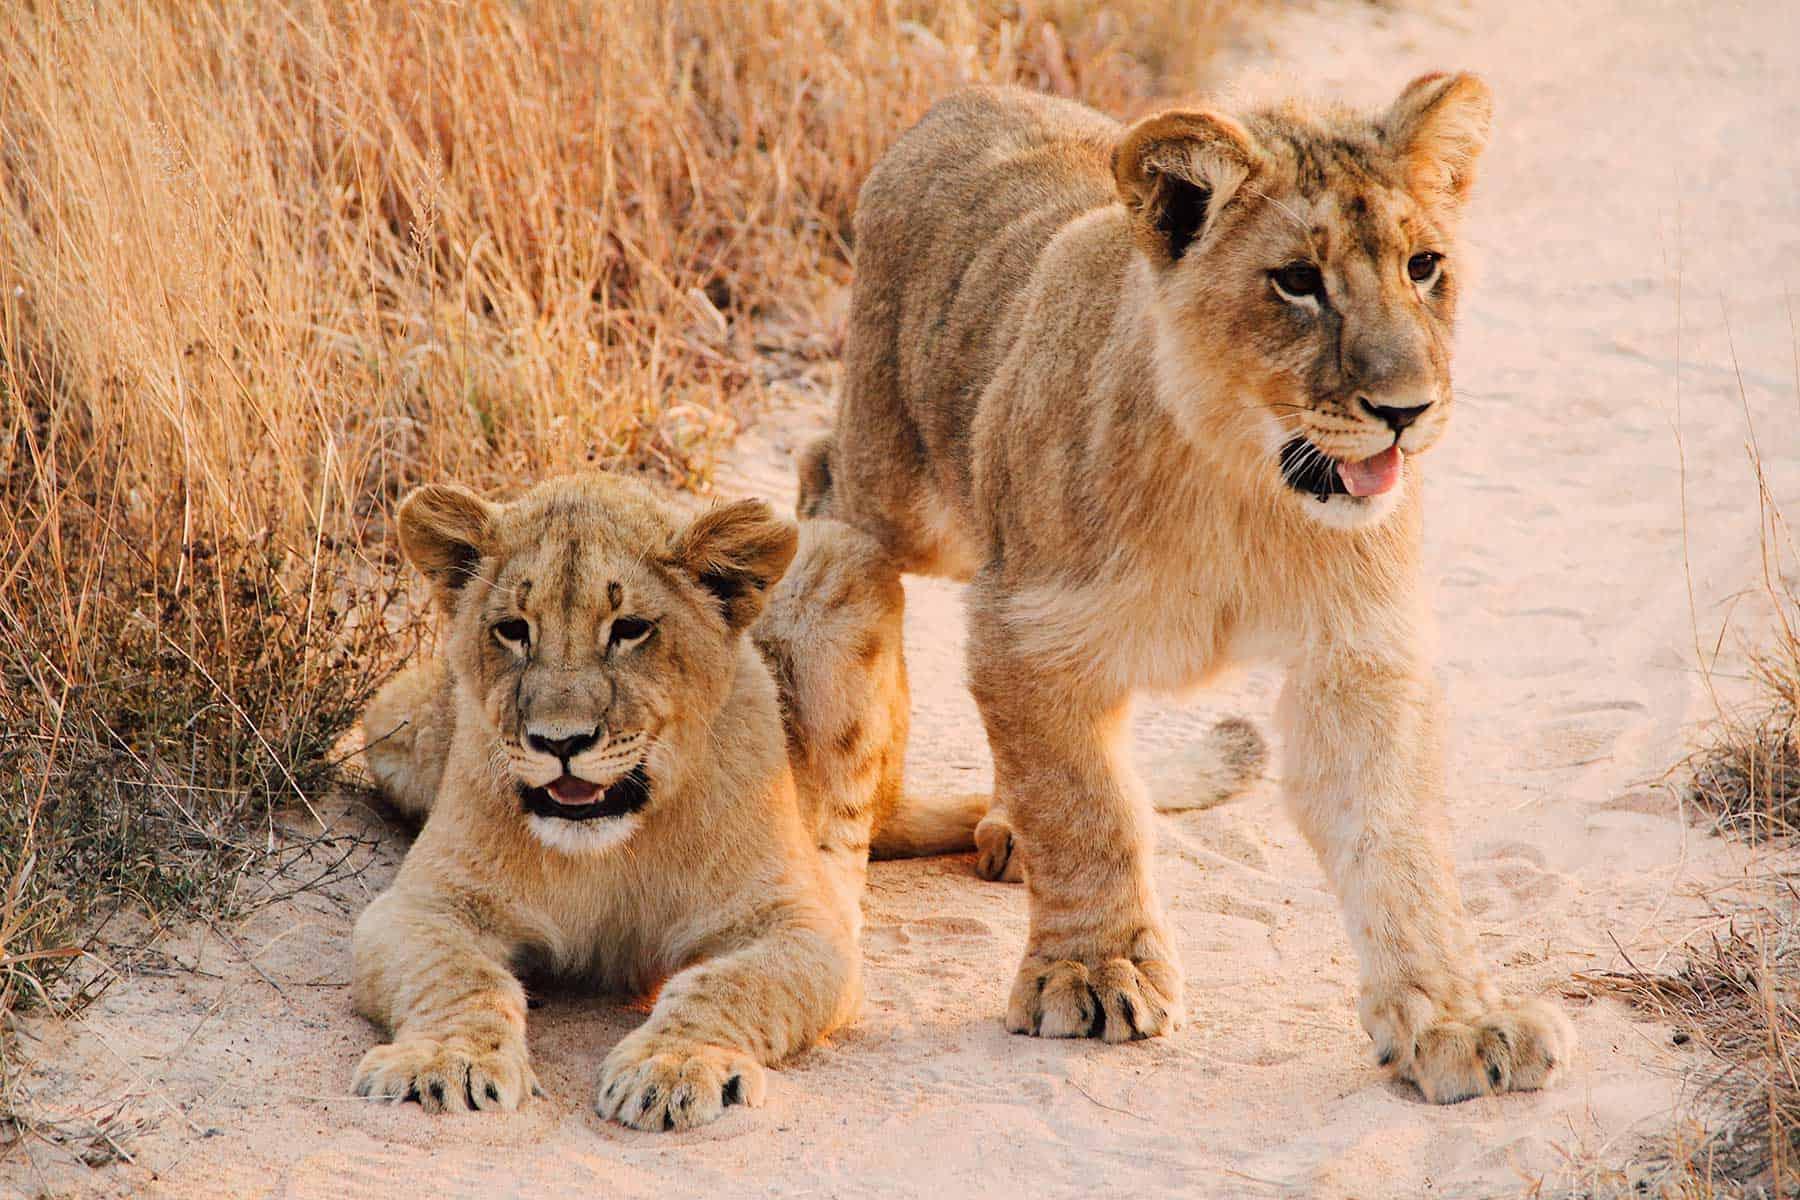 Safariresor_Zambia_Lejon_2_Nygren_Lind_Resebyrå